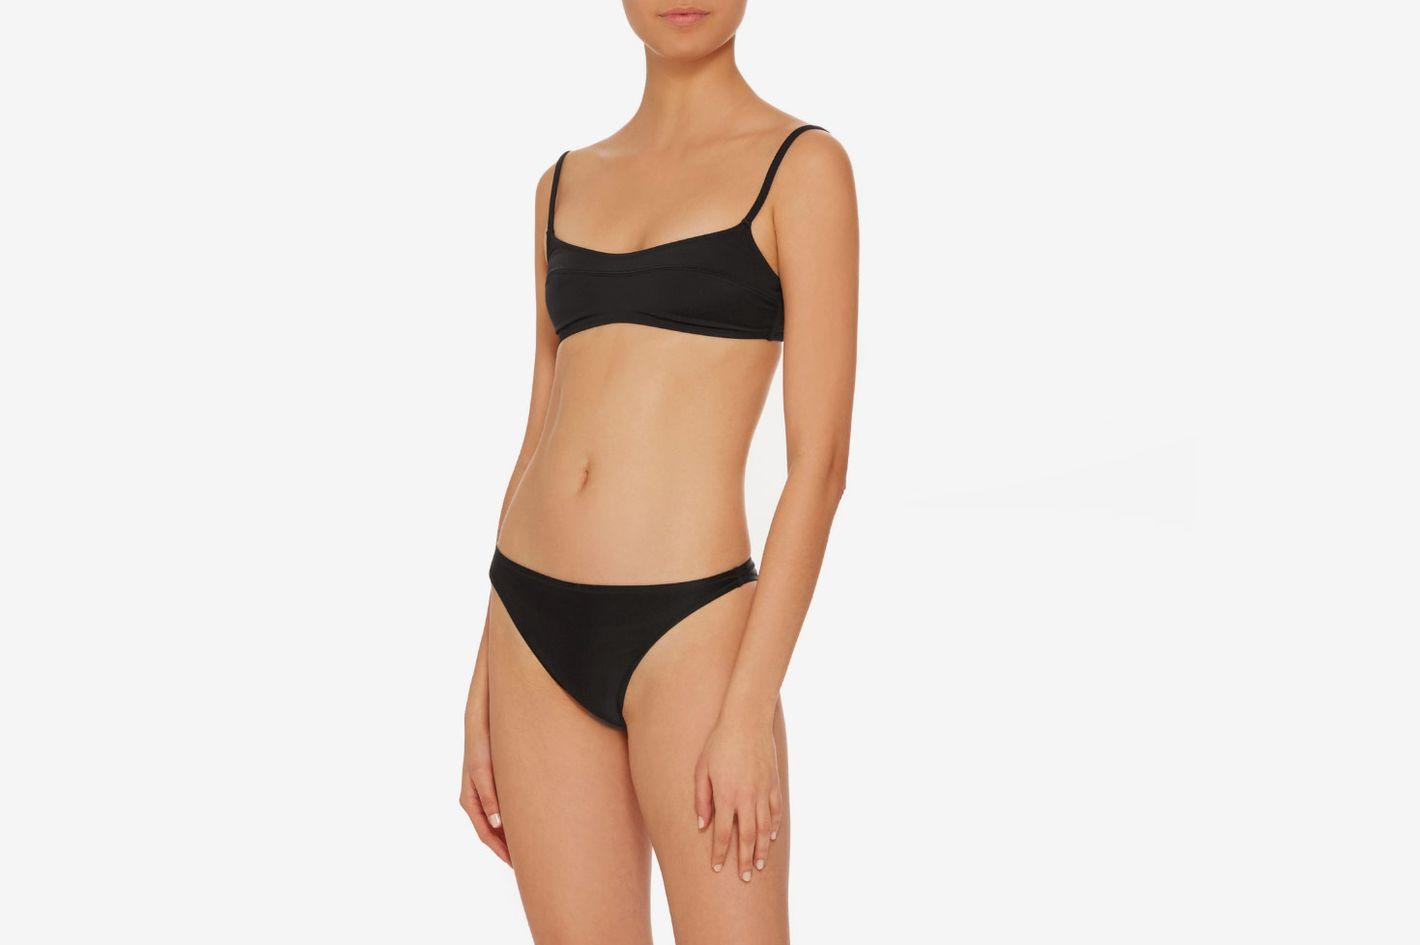 Solid & Striped Swim Team 2018 The Elsa Bikini Top